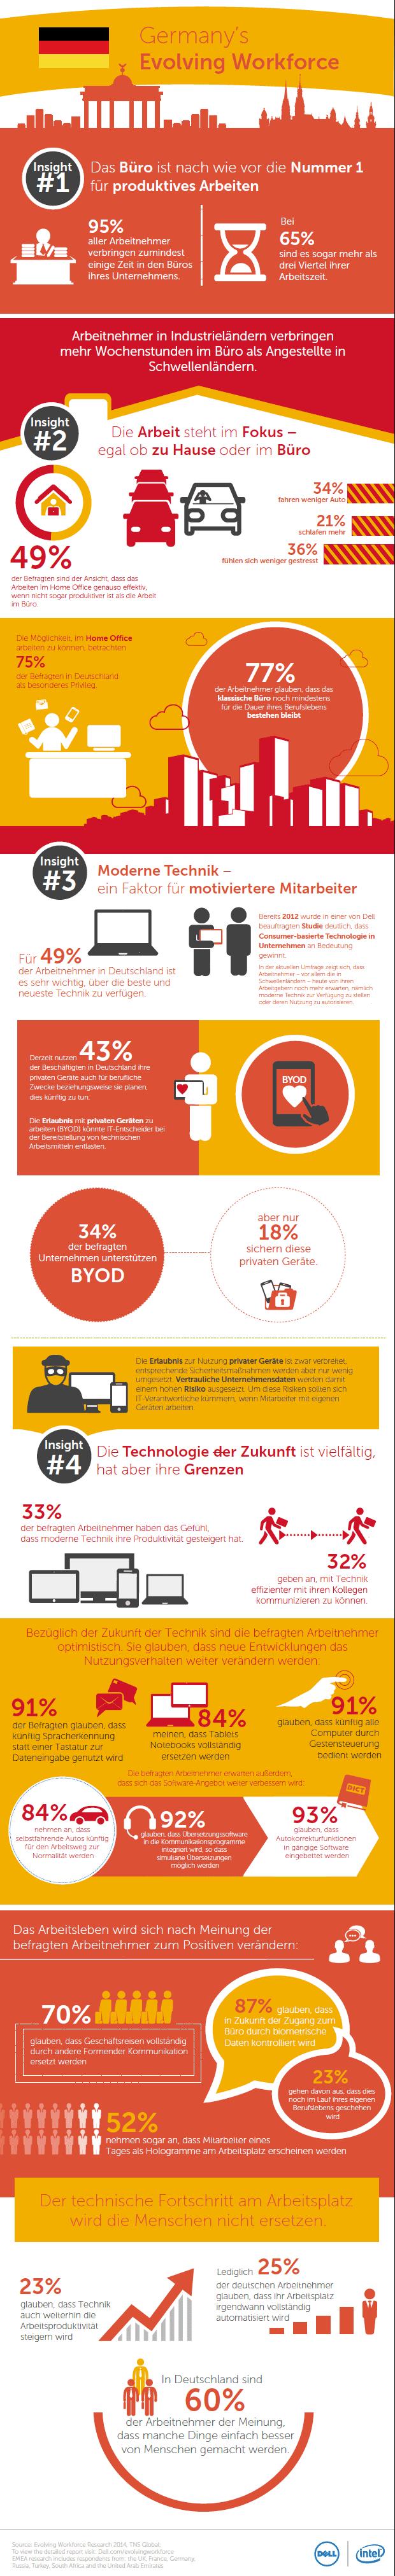 Buro zukunft trends modernen arbeitsplatz 2620800 - sixpacknow.info